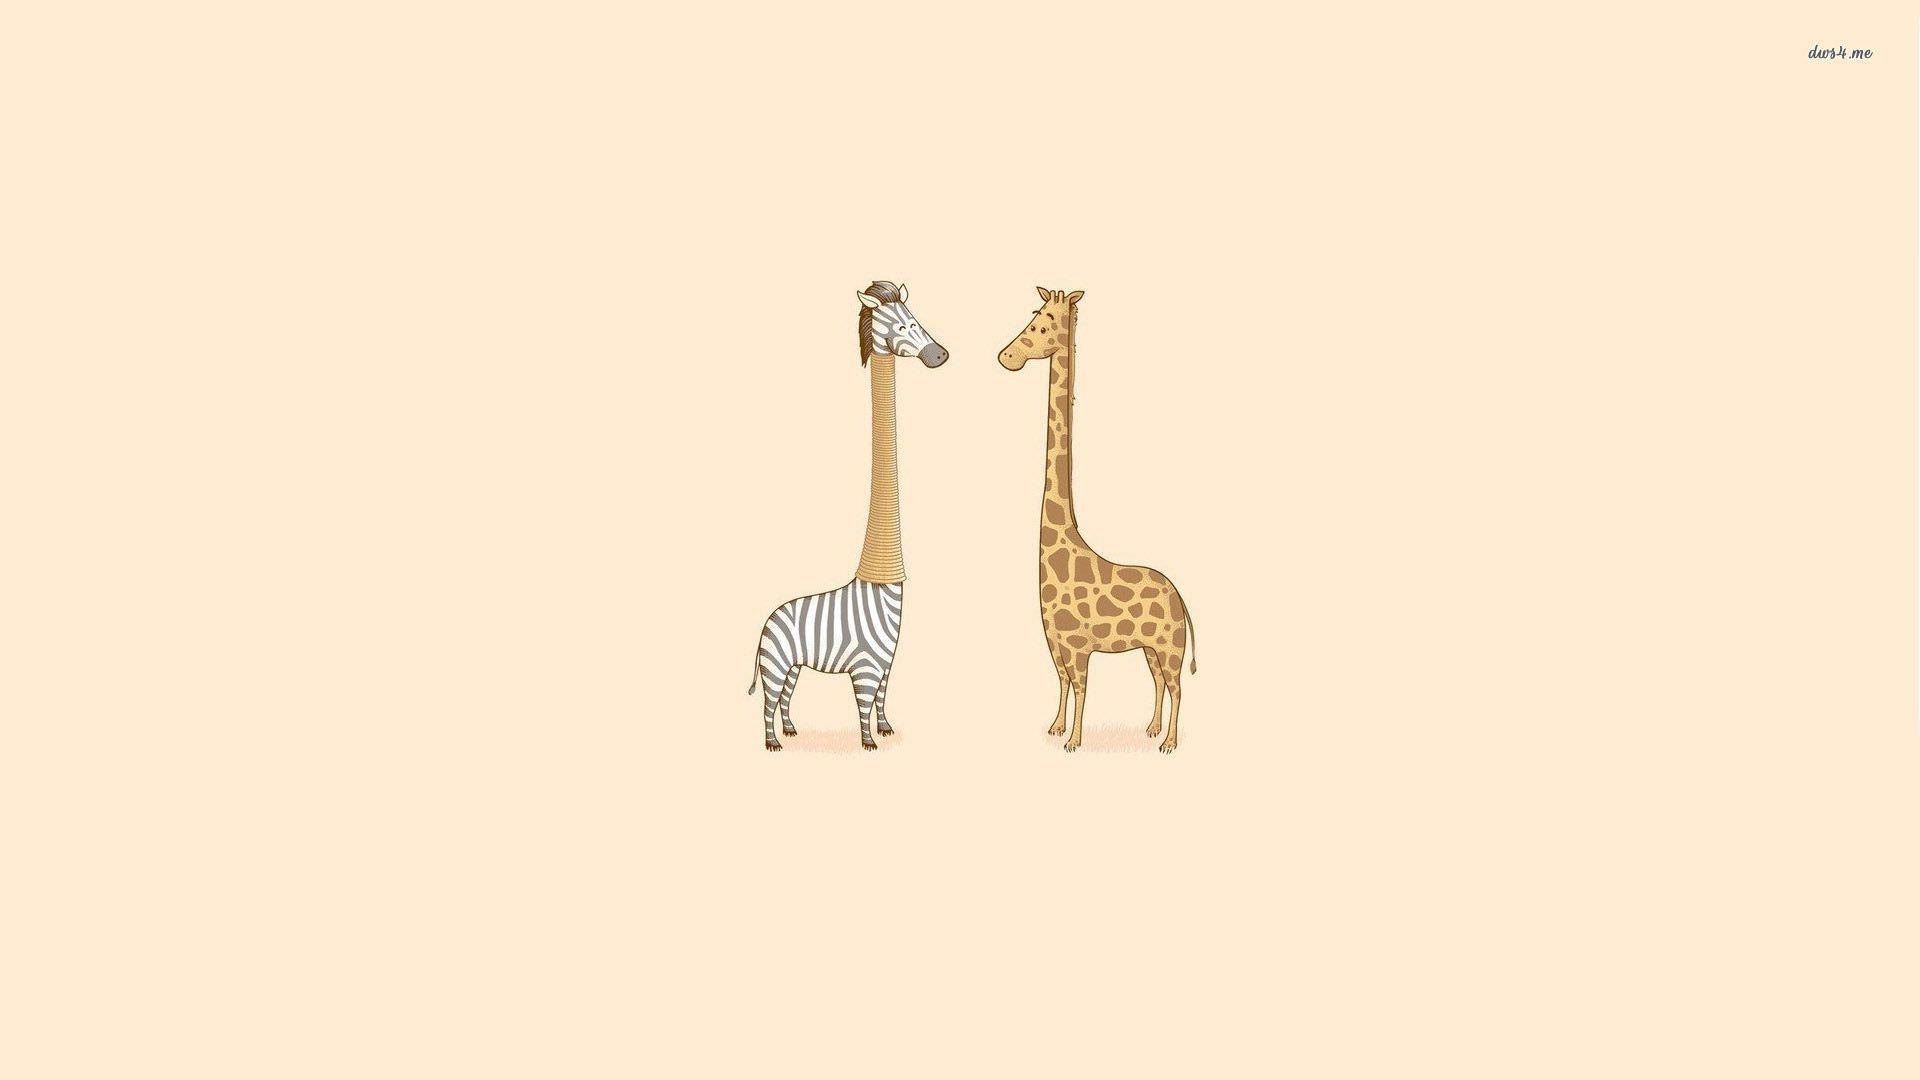 long neck zebra and giraffe drawing